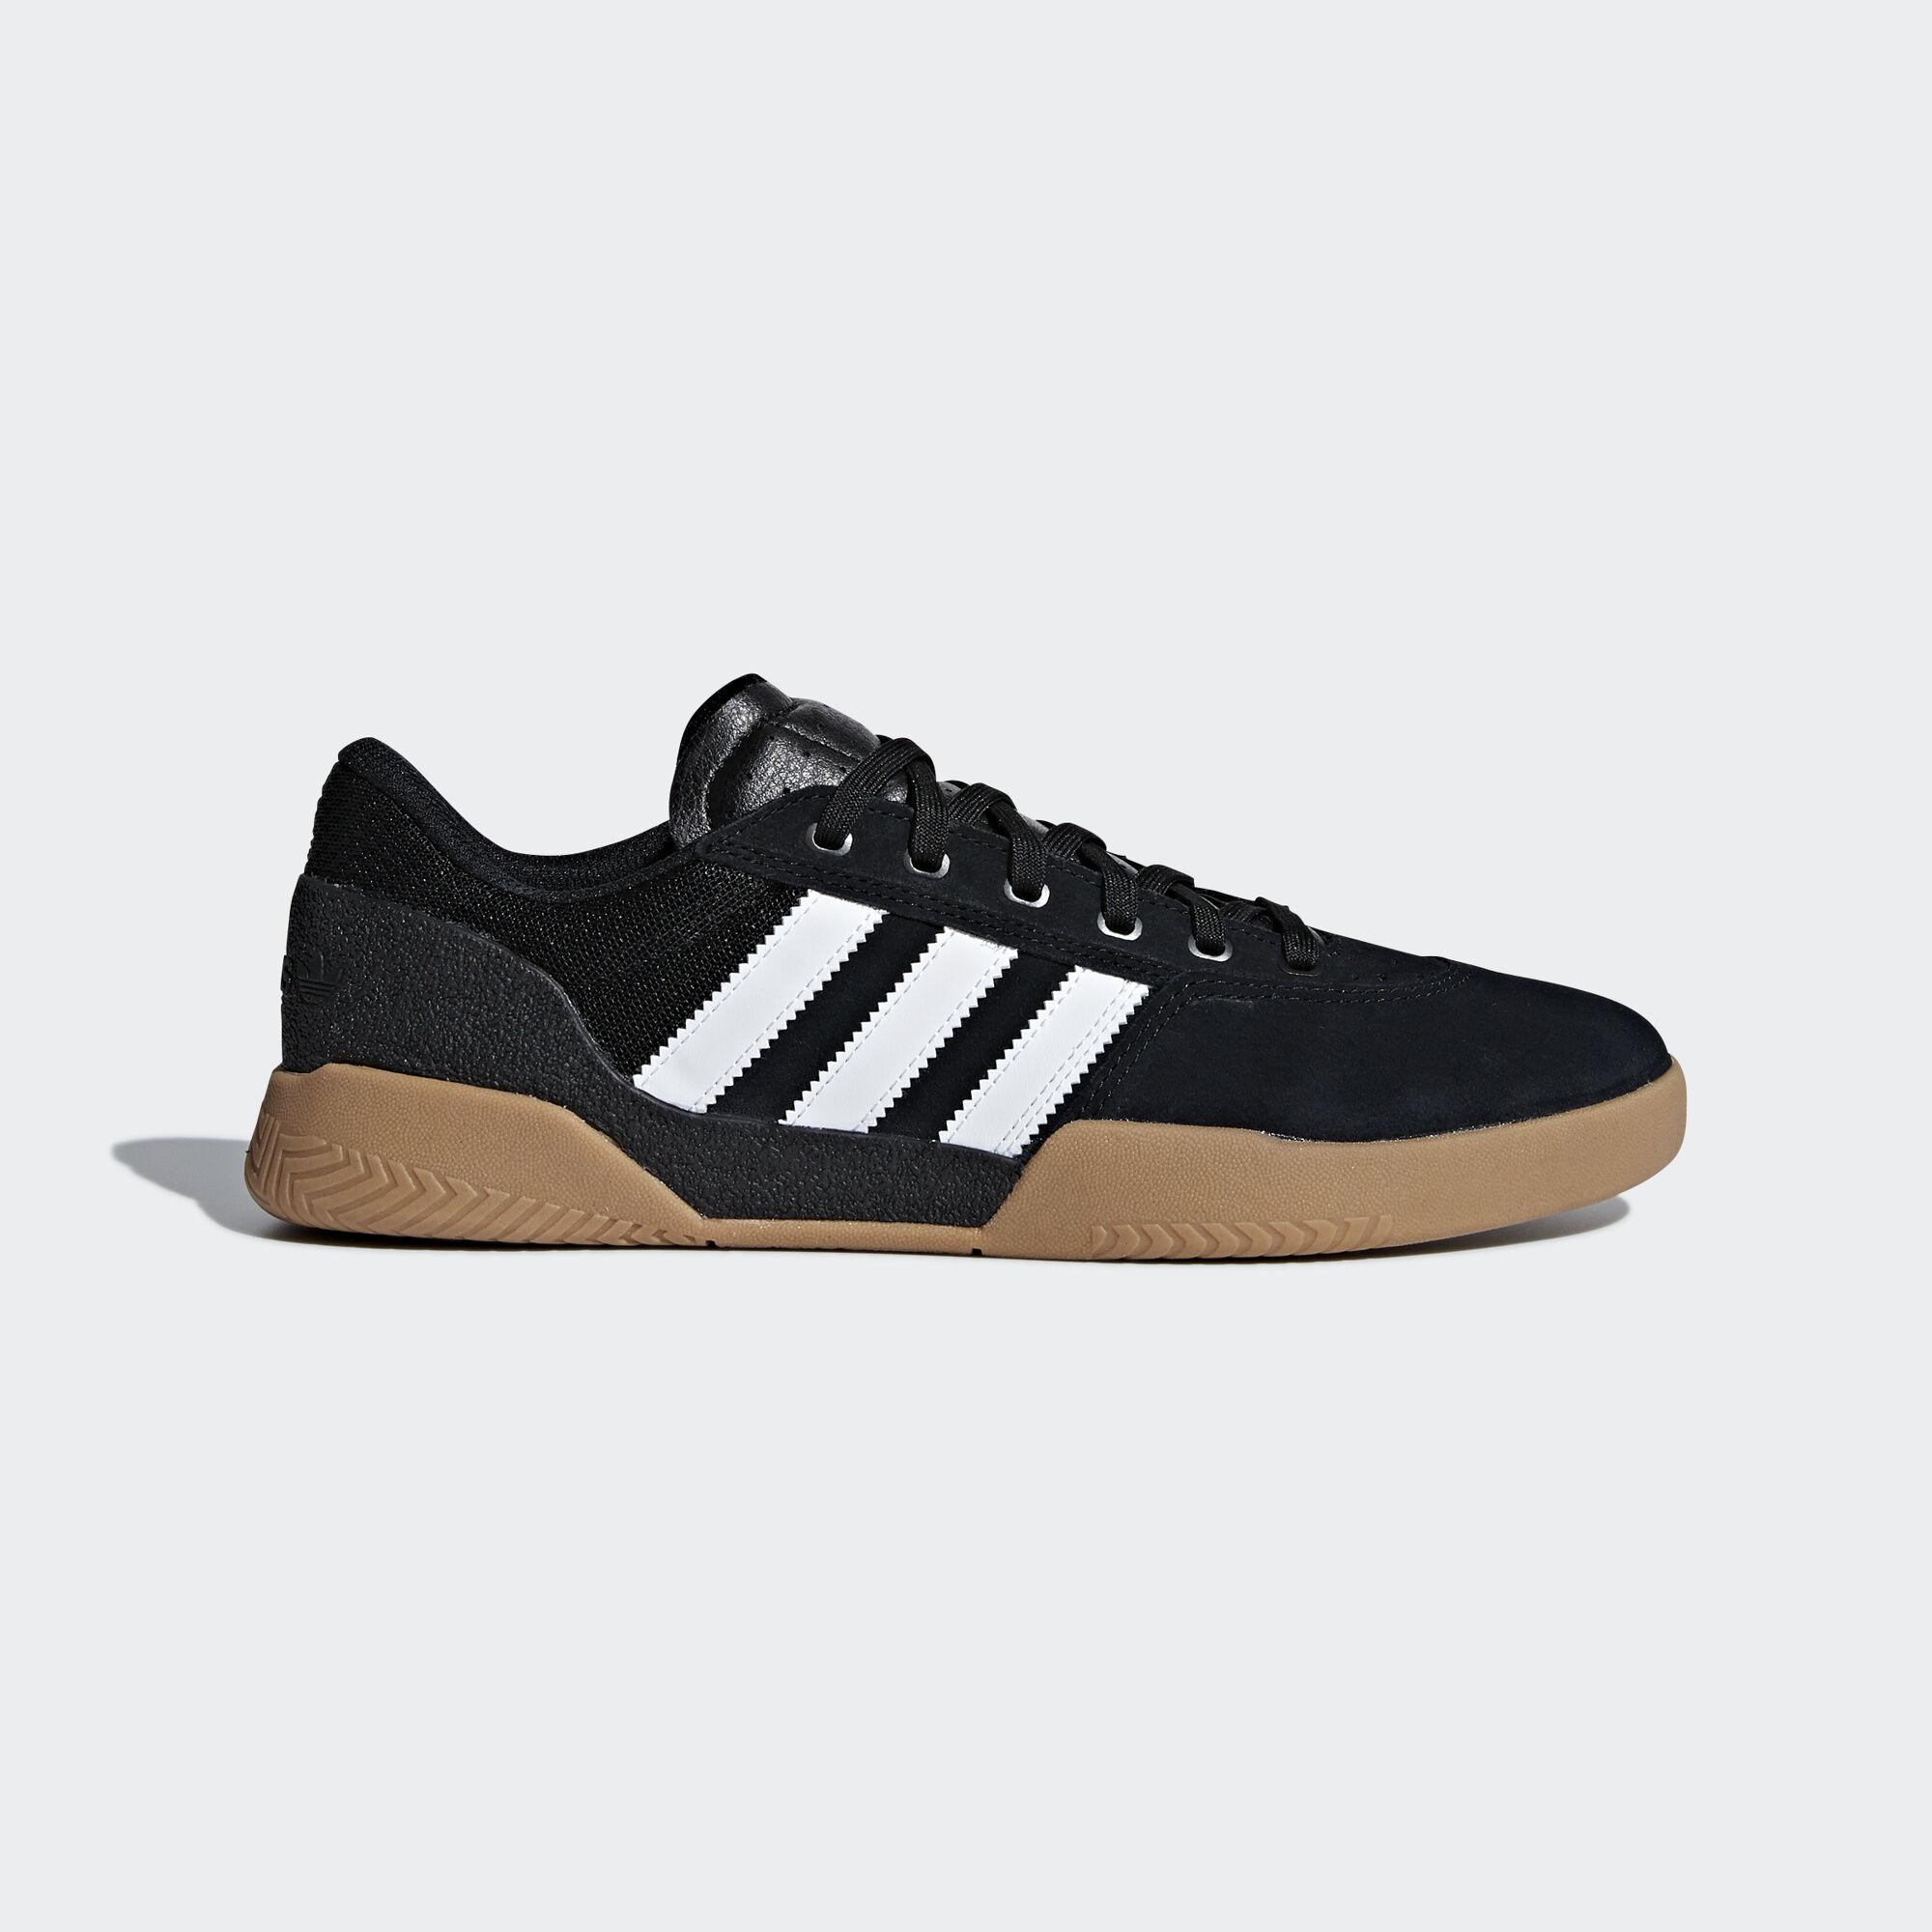 Adidas - City Cup  Mens Skate Shoes - CQ1081  Black / White / Gum